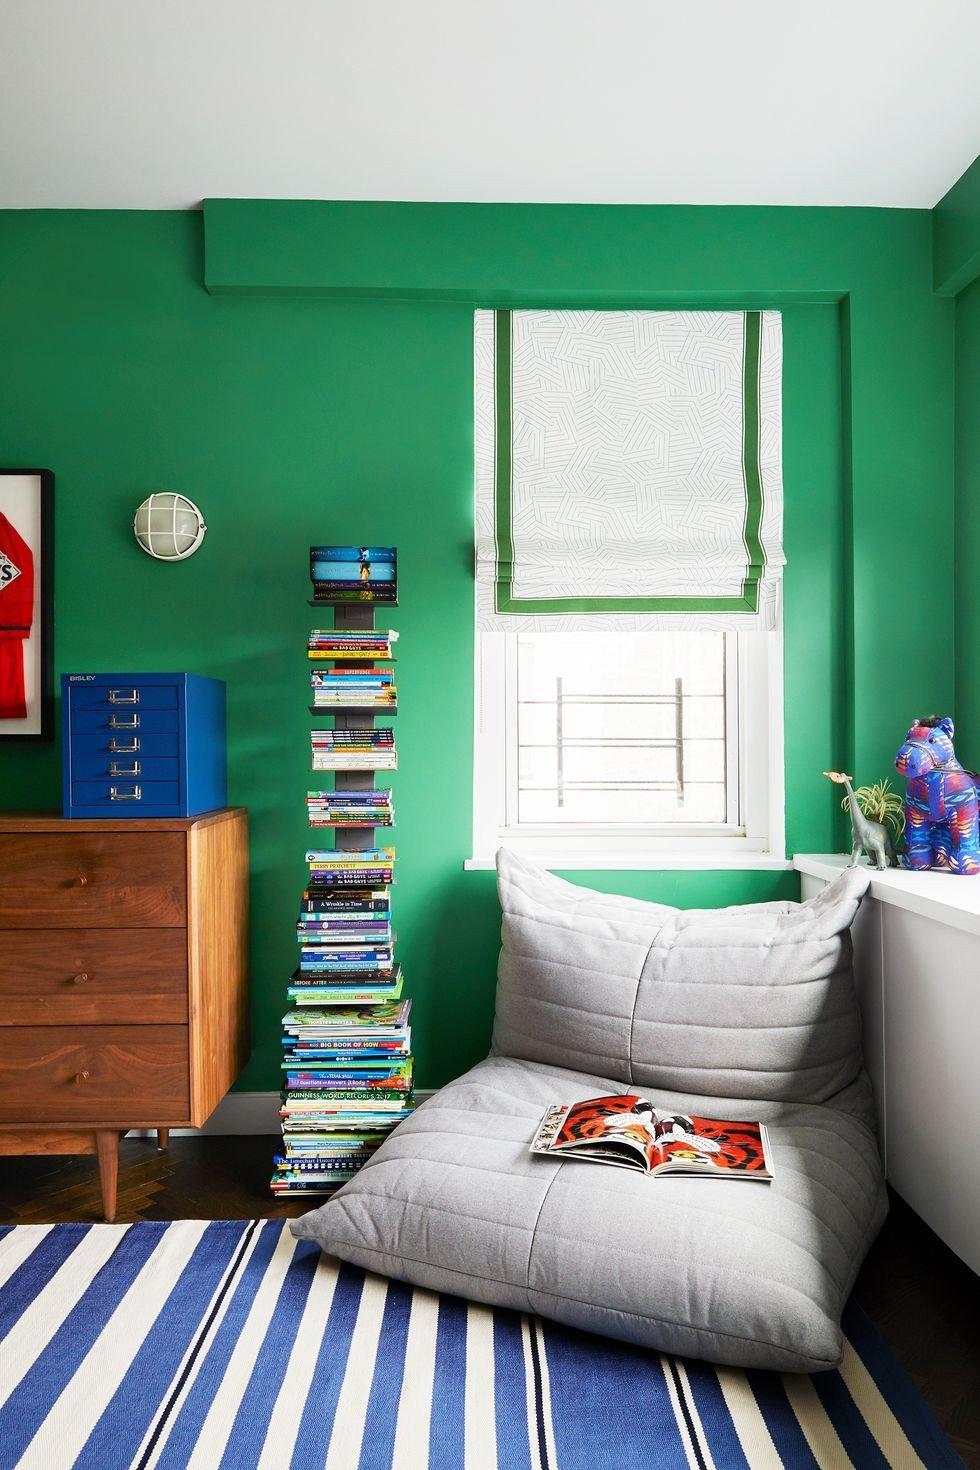 10 Year Old Boy Bedroom Ideas Luxury 30 Best Kids Room Ideas Diy Boys and Girls Bedroom